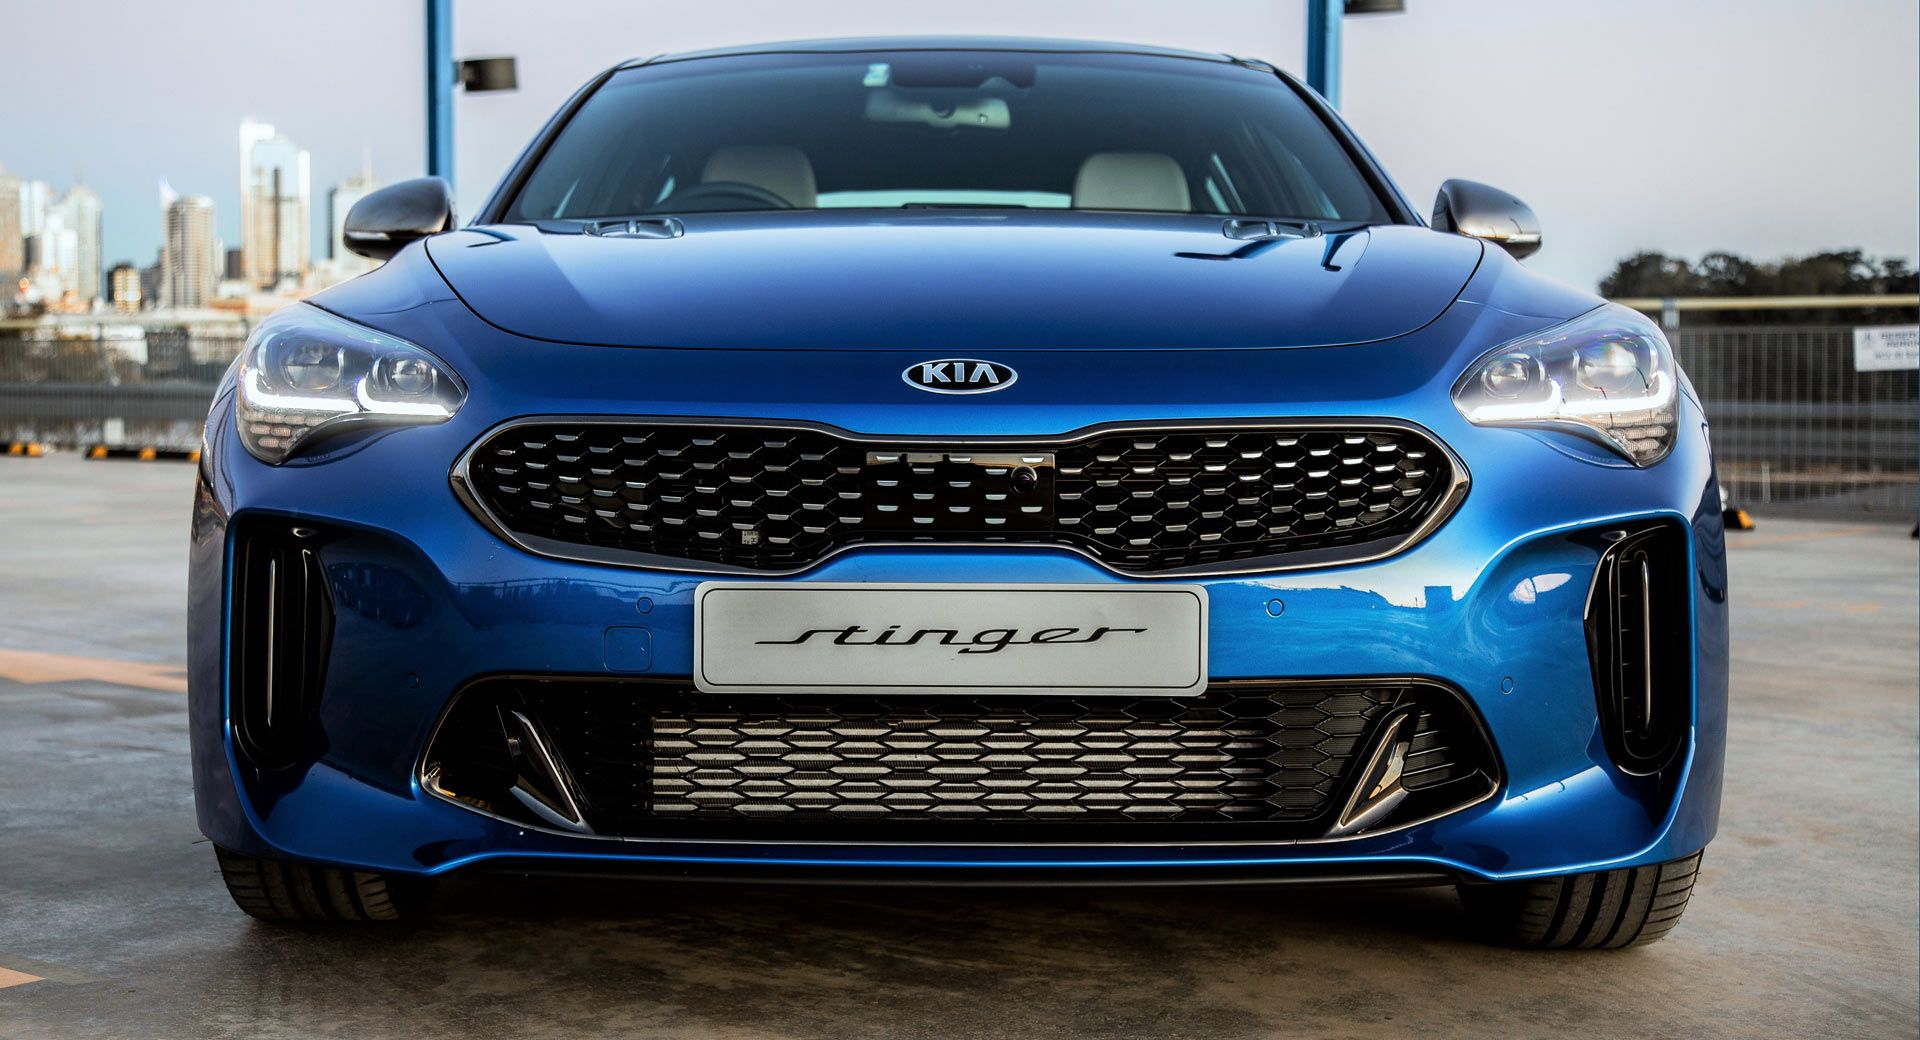 Kia Gives Aussies New Stinger Night Sky Special Edition Australia Kia Kiastinger Newcars Cars Carsofinstagram Carporn Carlifes In 2020 Kia Stinger Kia New Cars